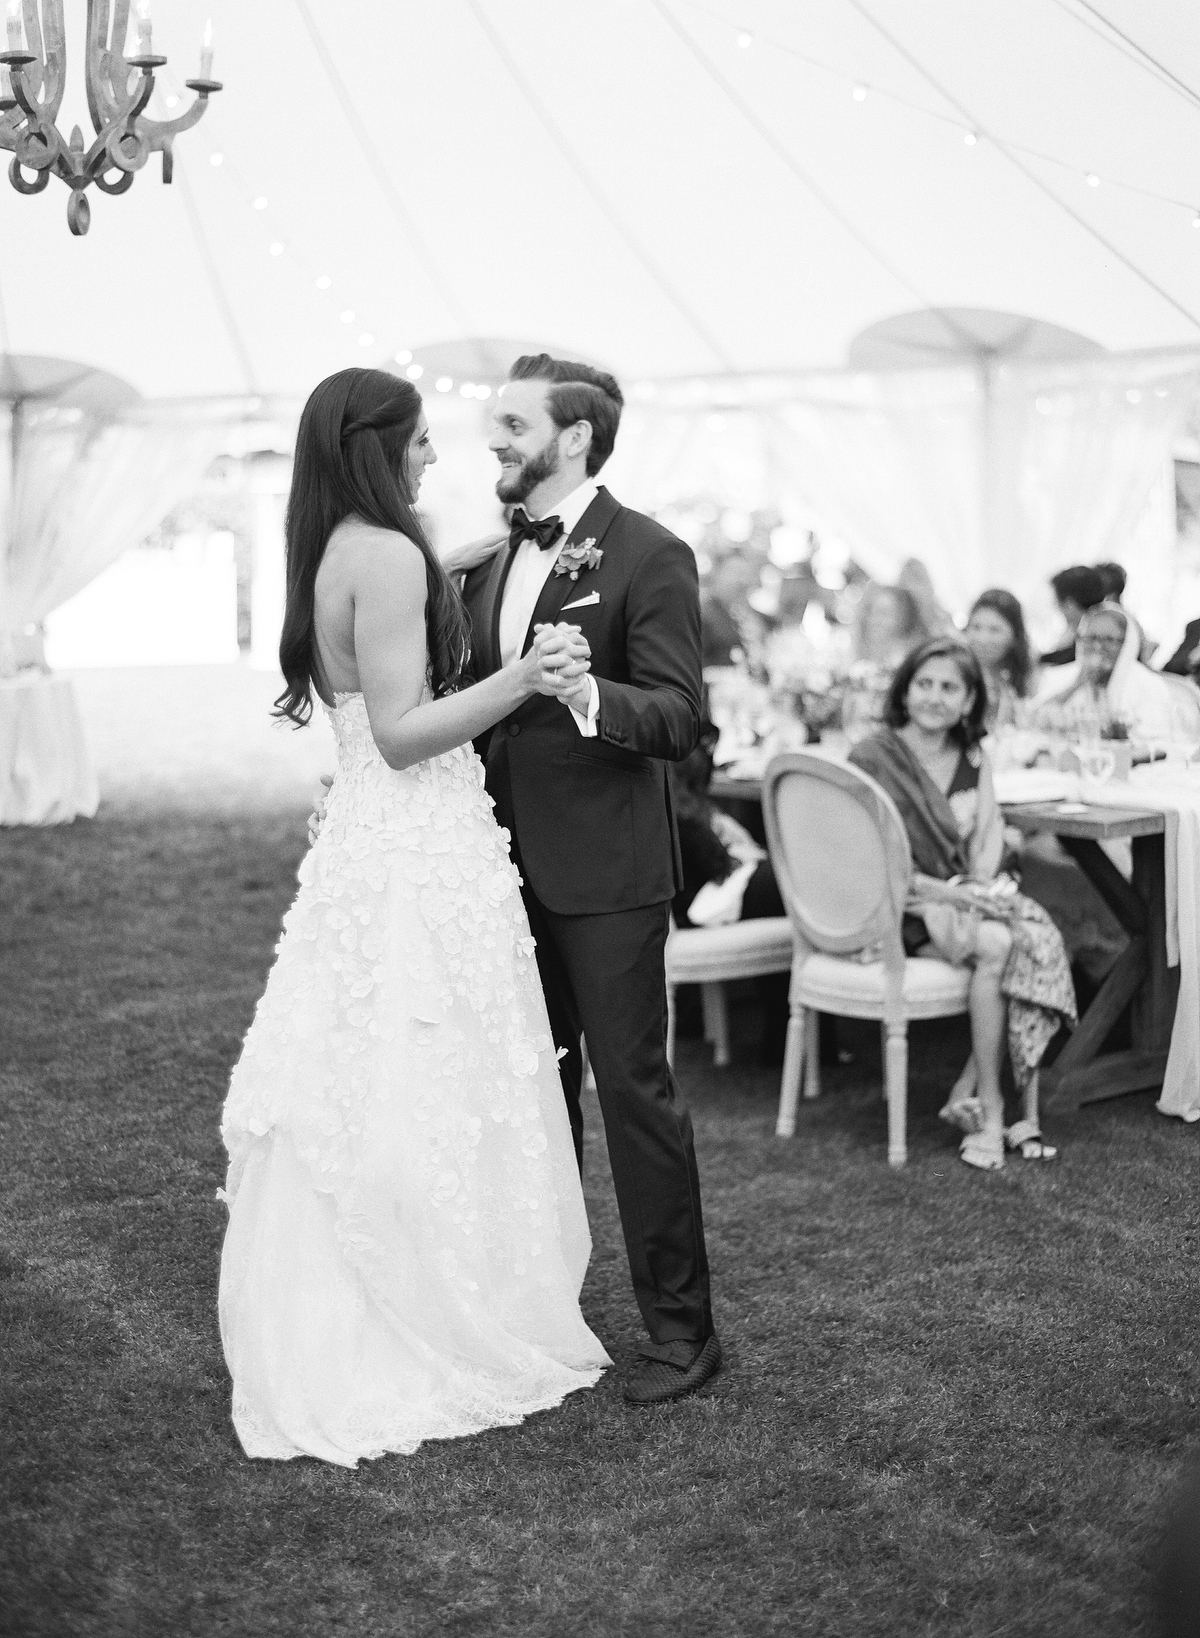 nadine dan wedding first dance